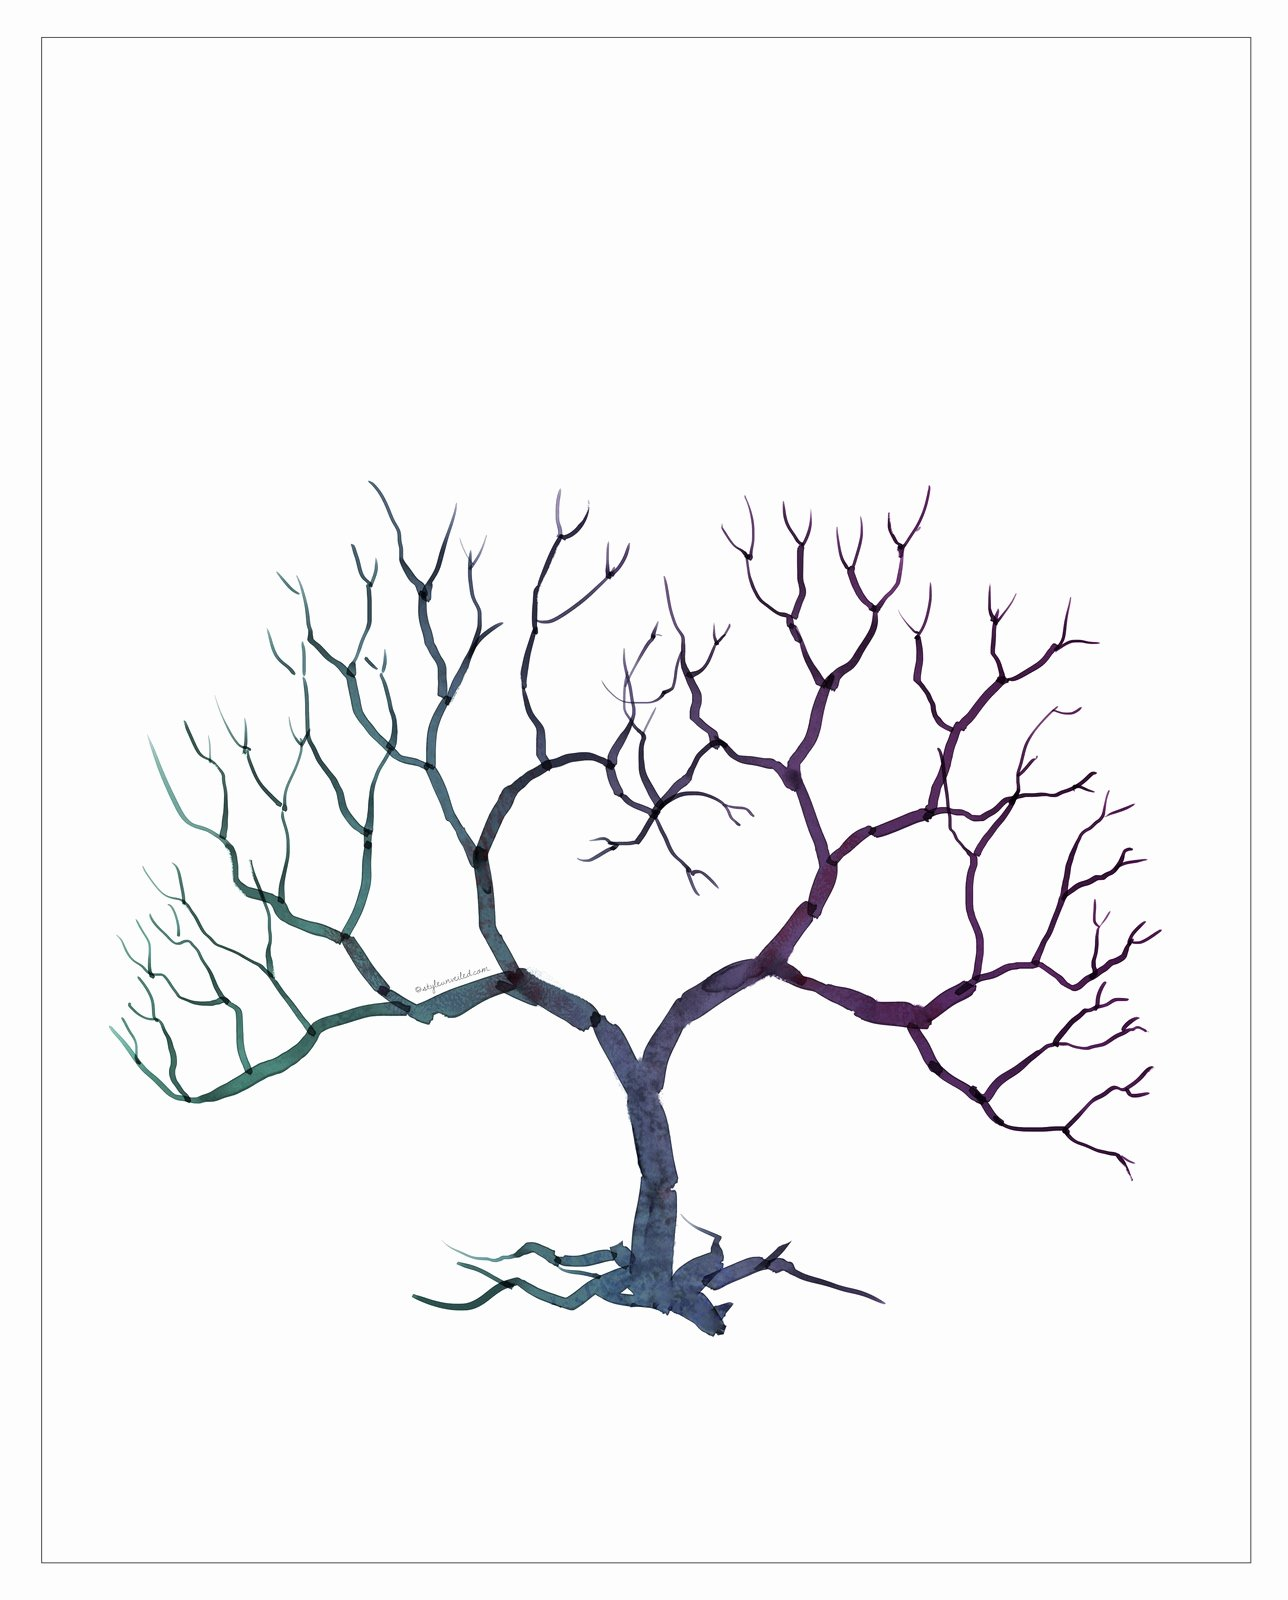 Blank Family Tree Book Fresh Floralisa Weddings and events Diy Fingerprint Tree